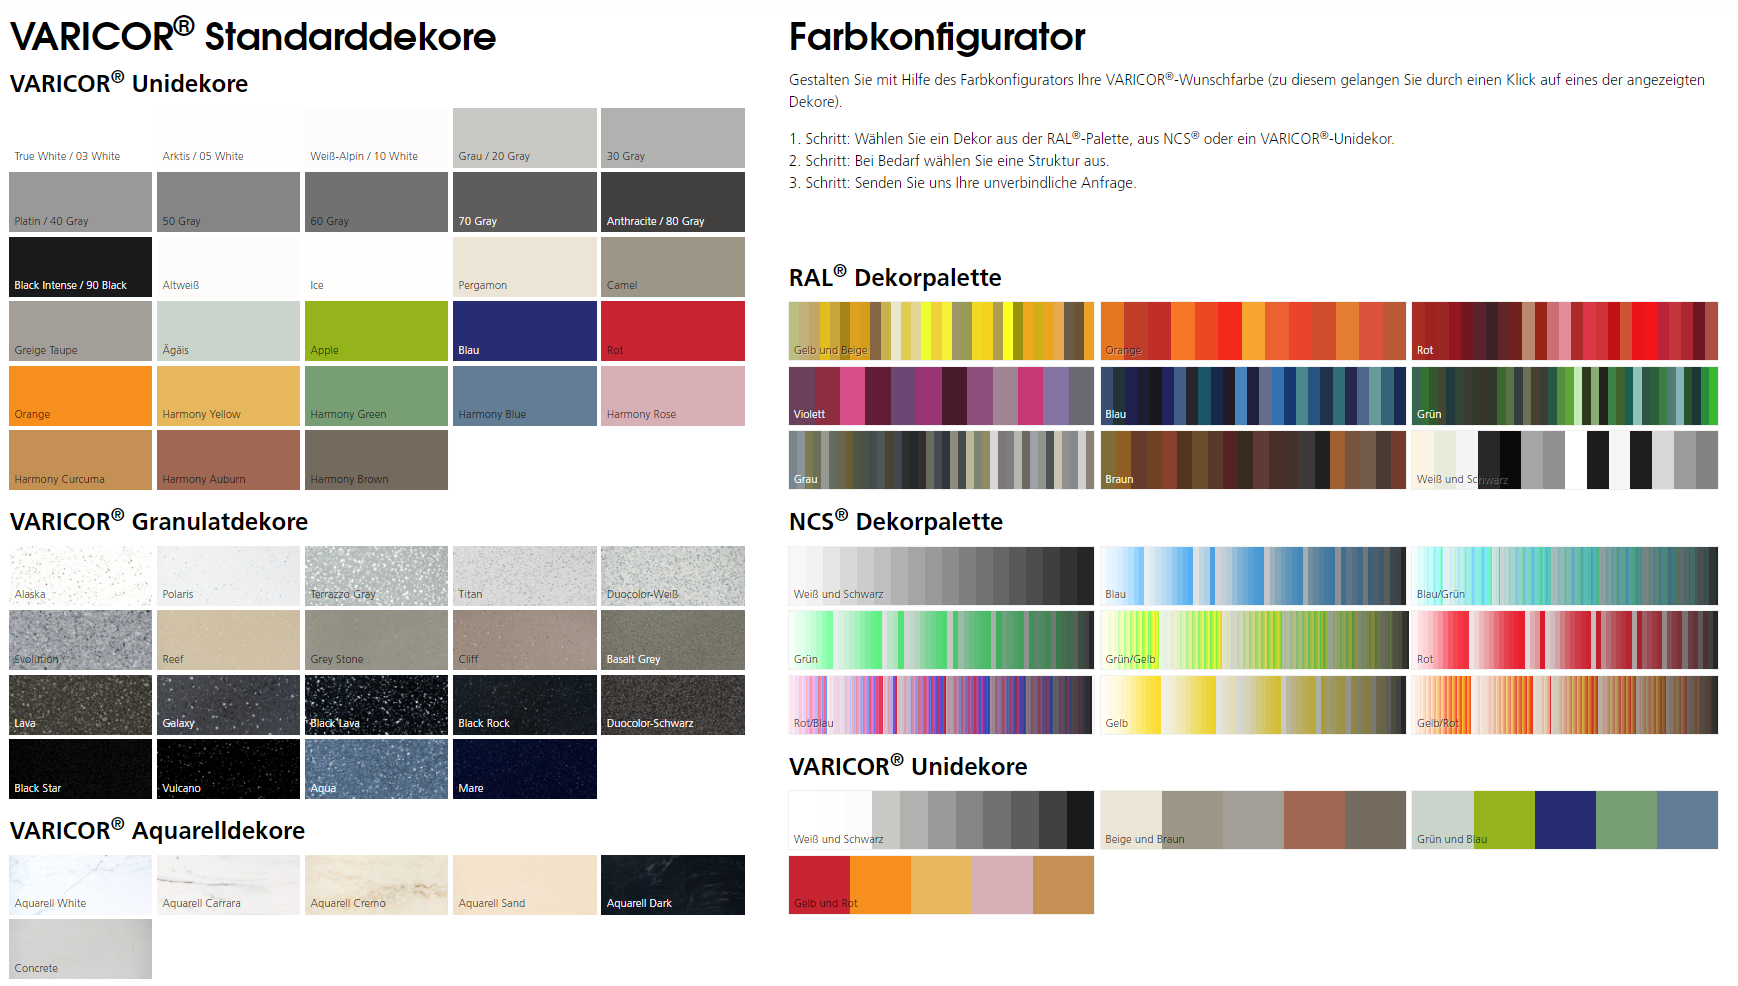 Varicor® Farbkonfigurator (Mineralwerkstoff)